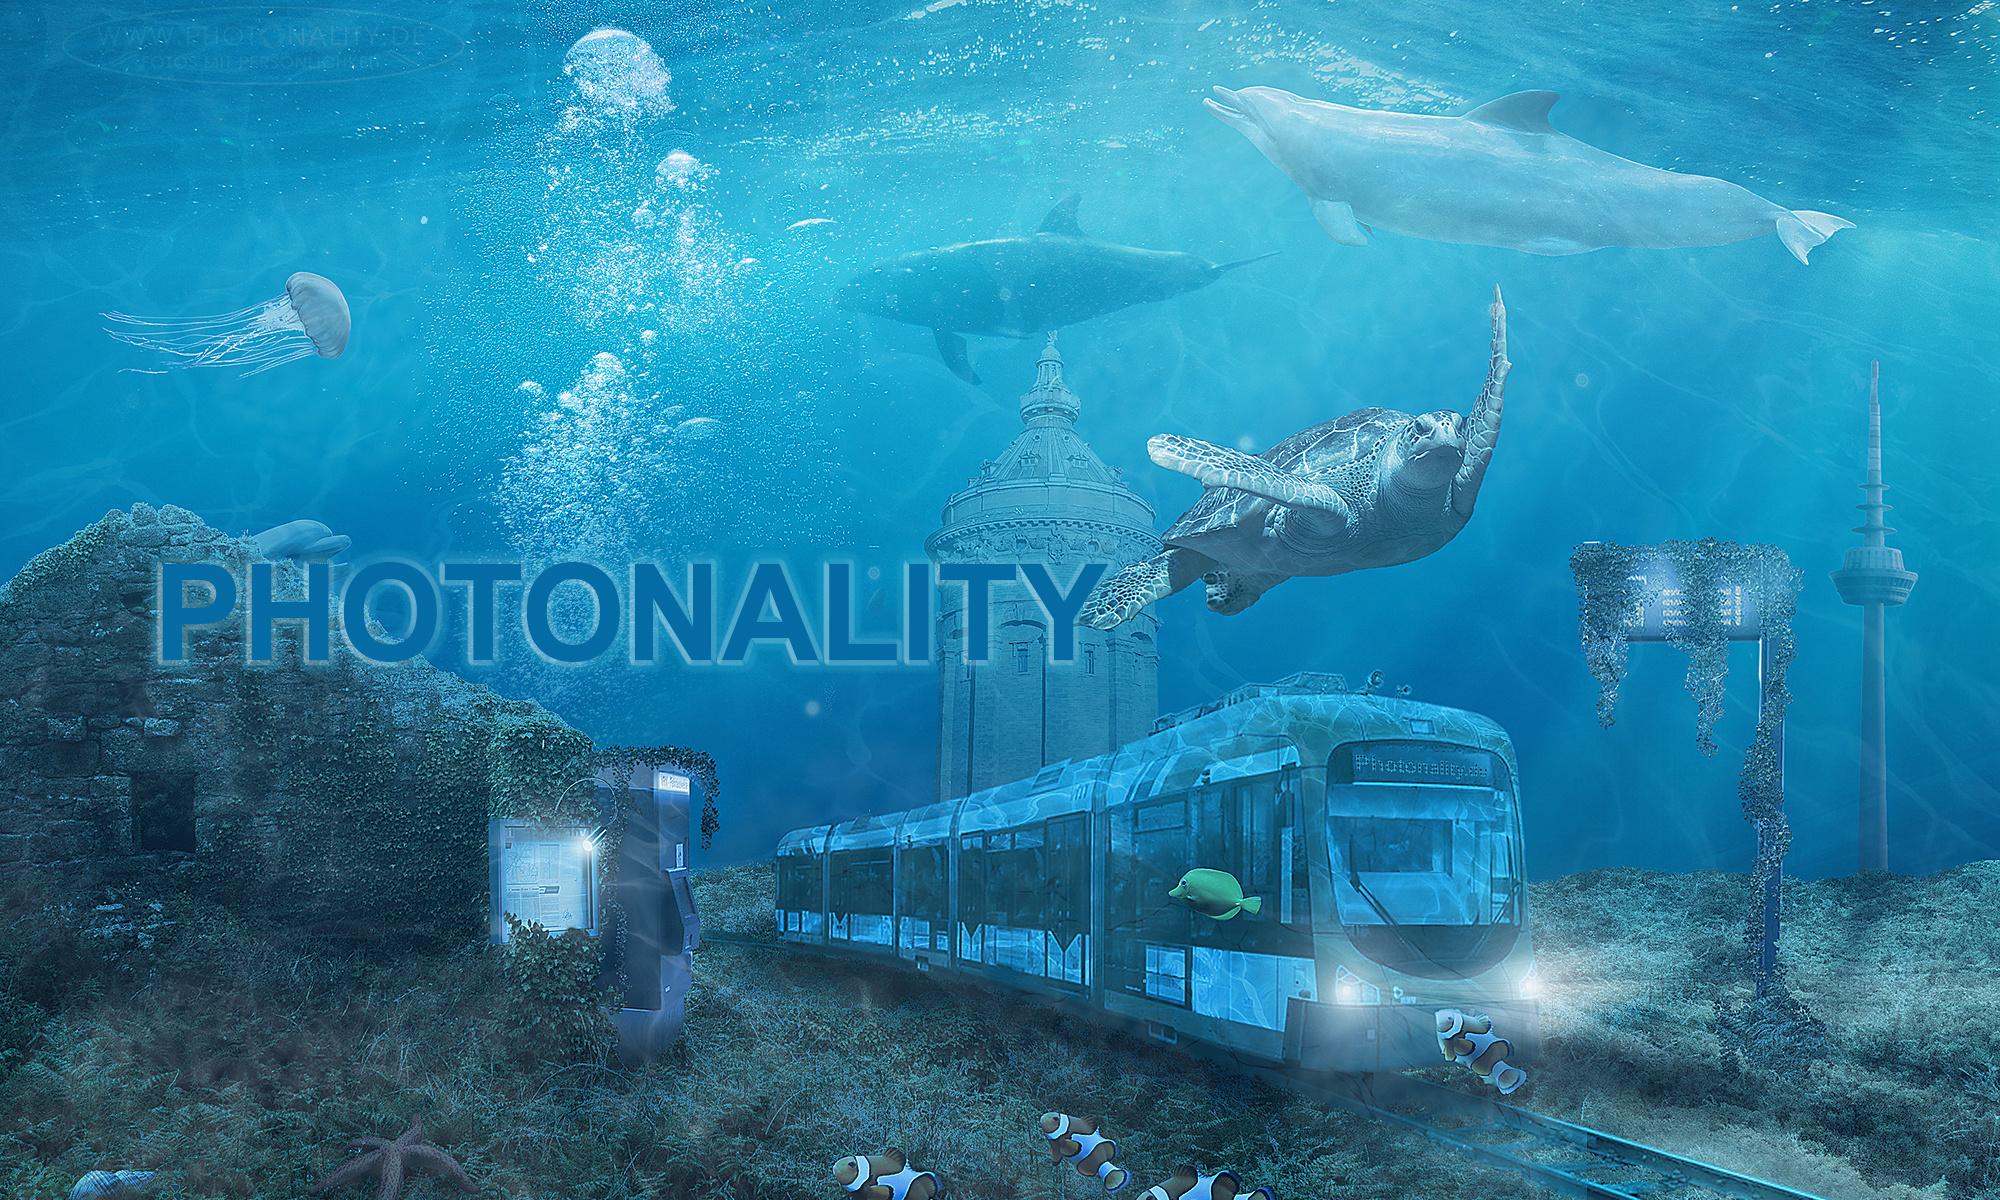 Photonality - Fotos mit Persönlichkeit